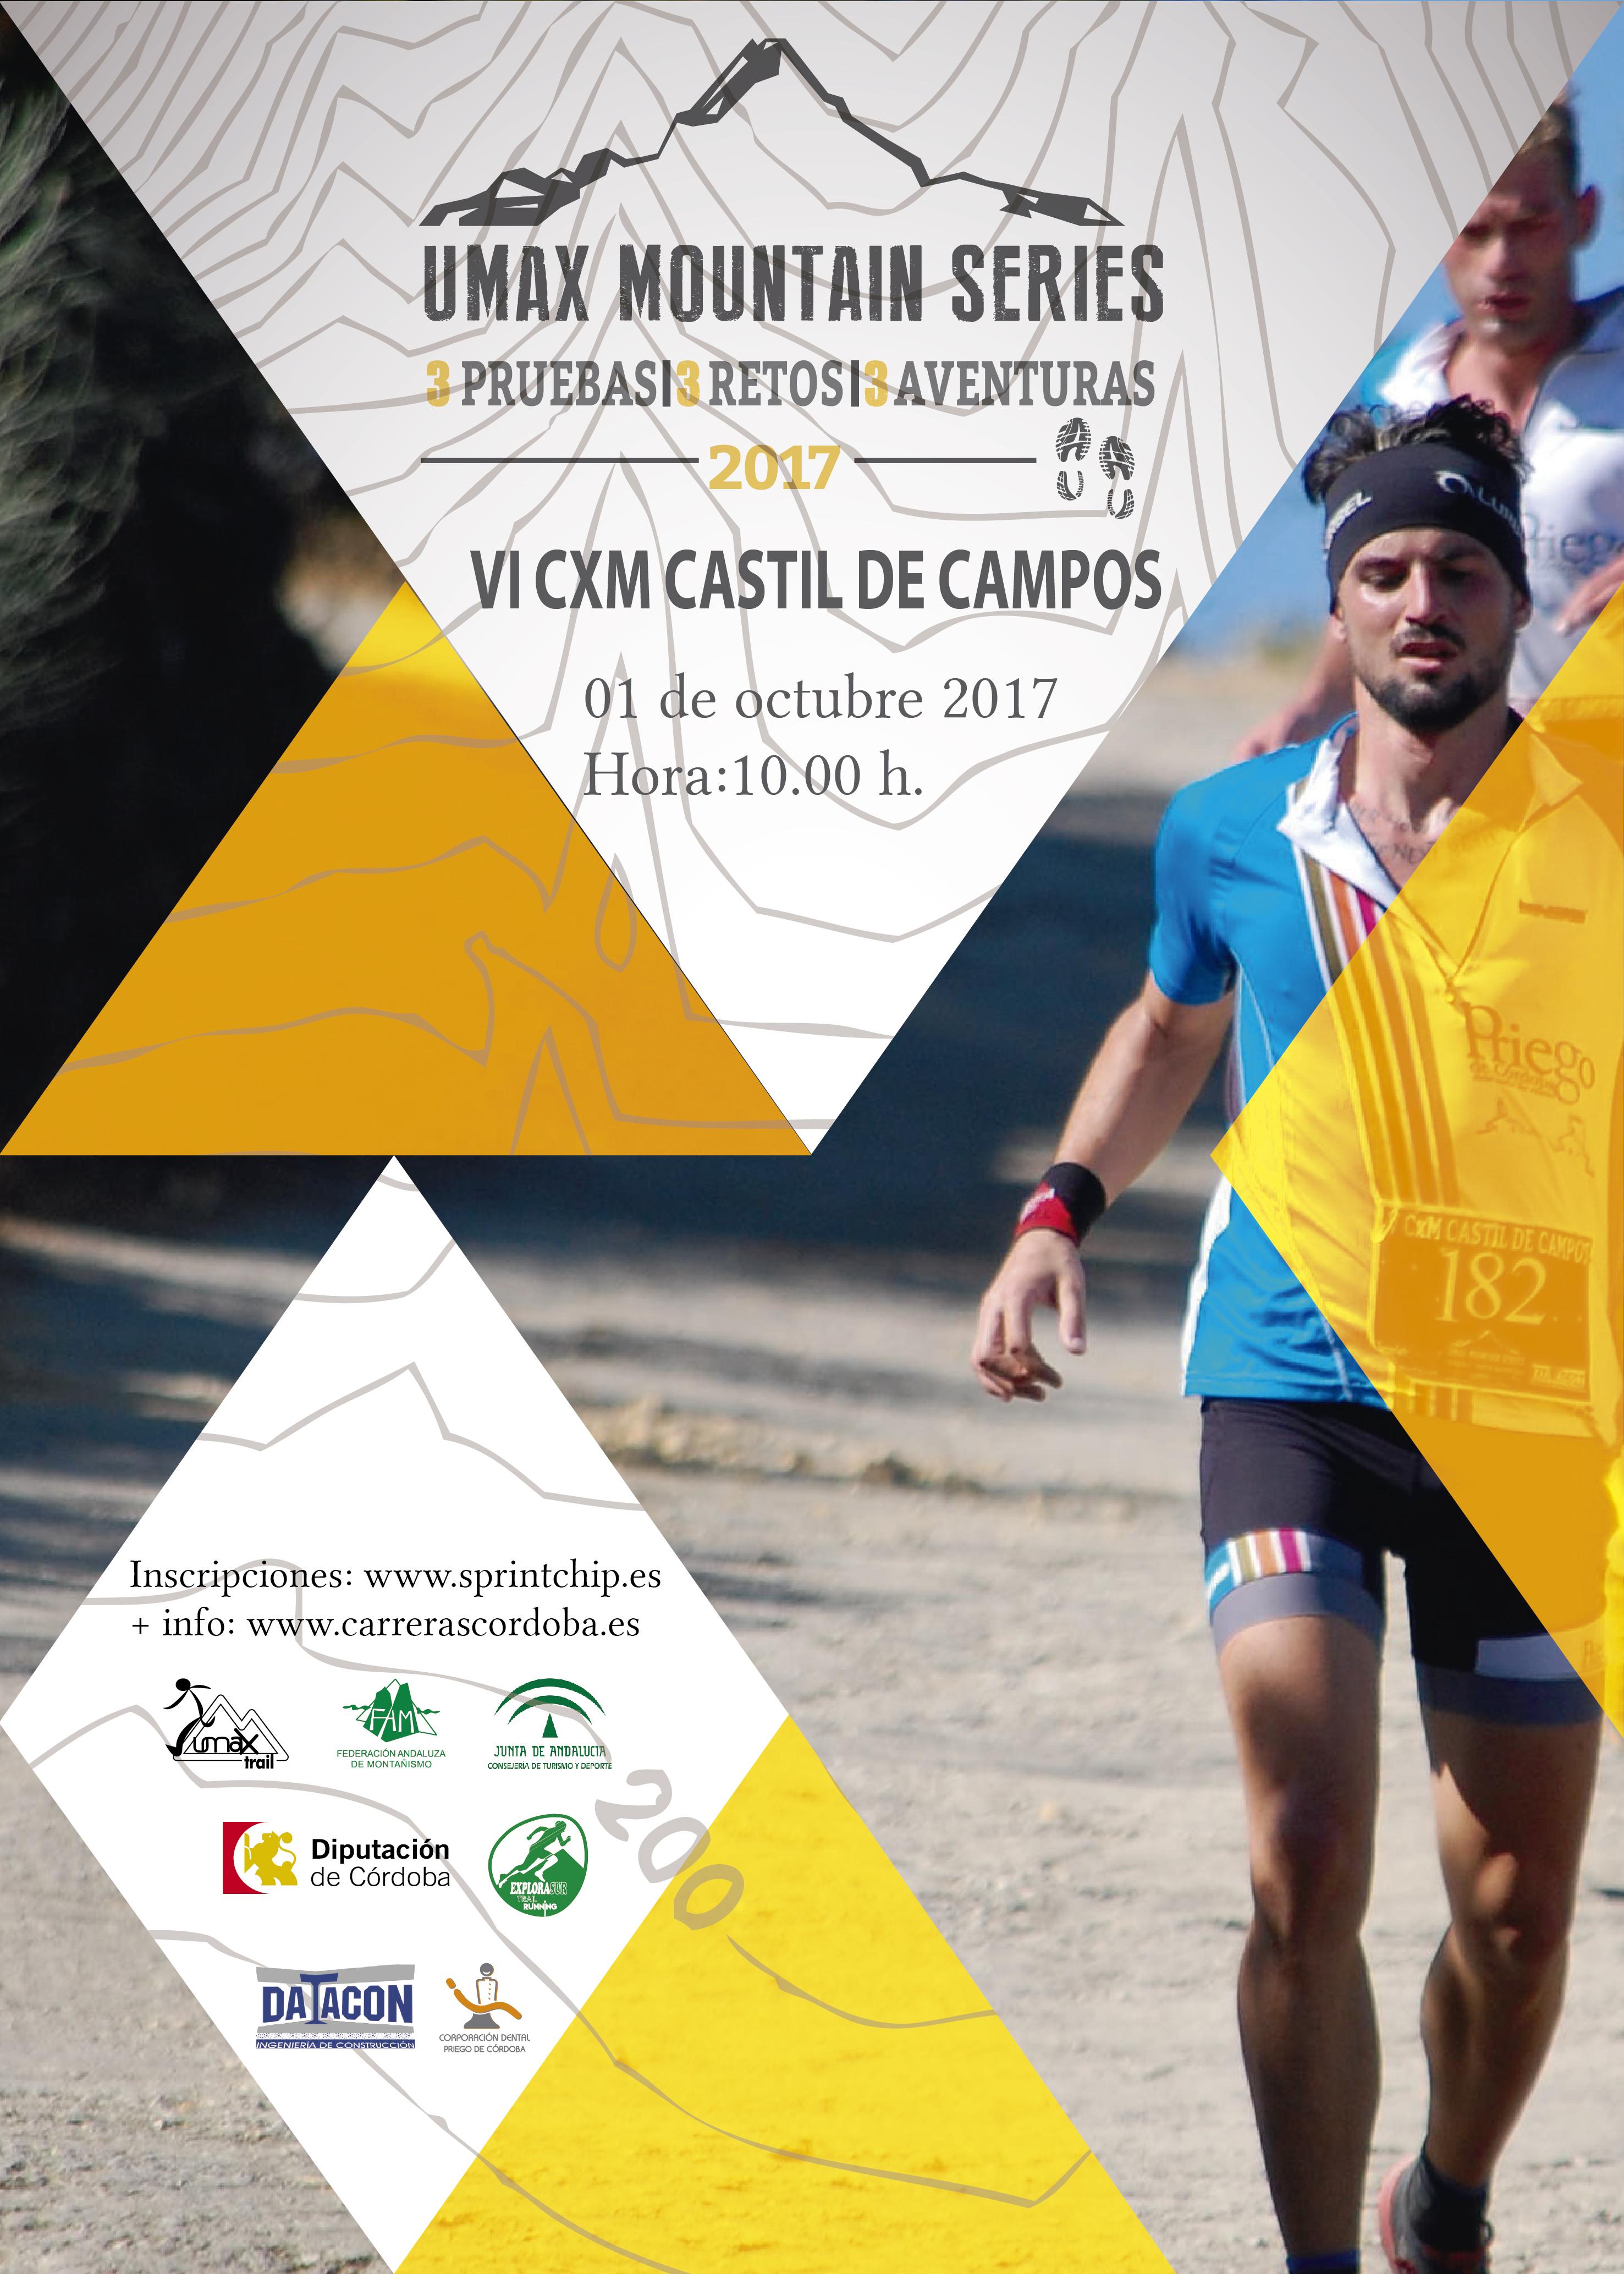 VI CxM Castil de Campos - Trail Corto - Sprint Chip